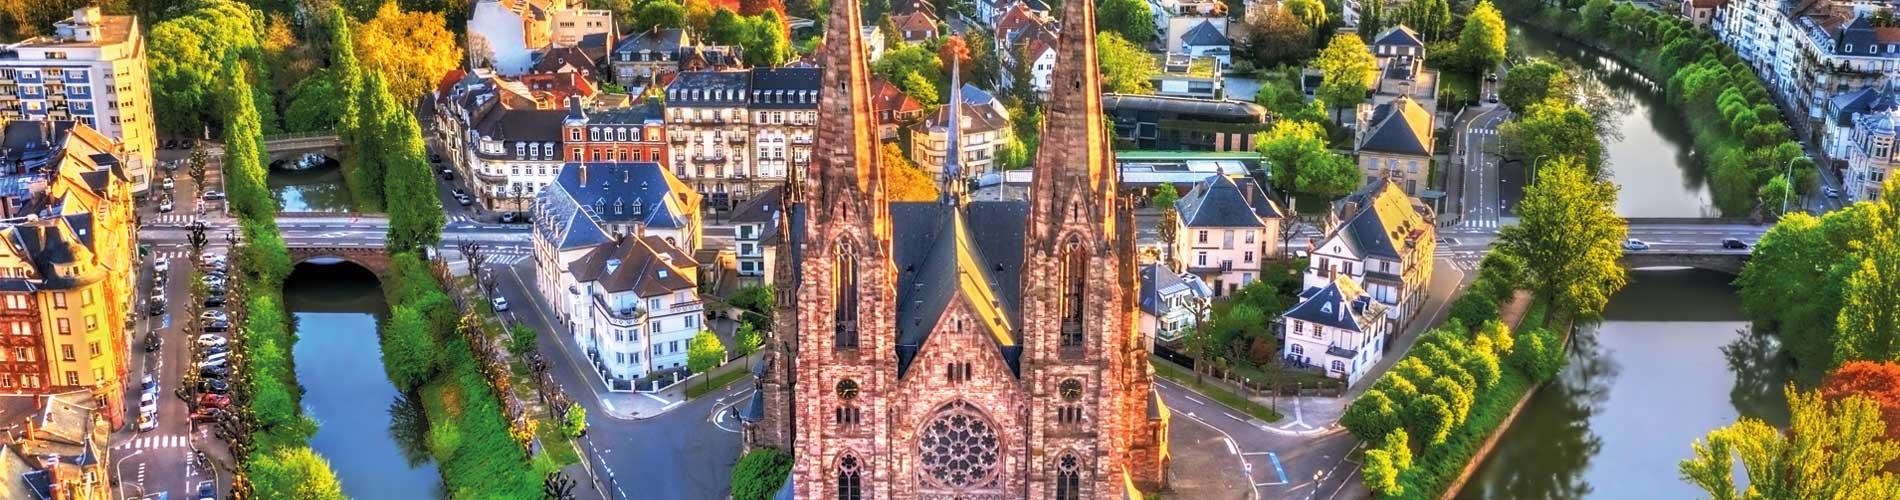 Blog_EarlyBooking_EC_Strasbourg_1900x500_Q120